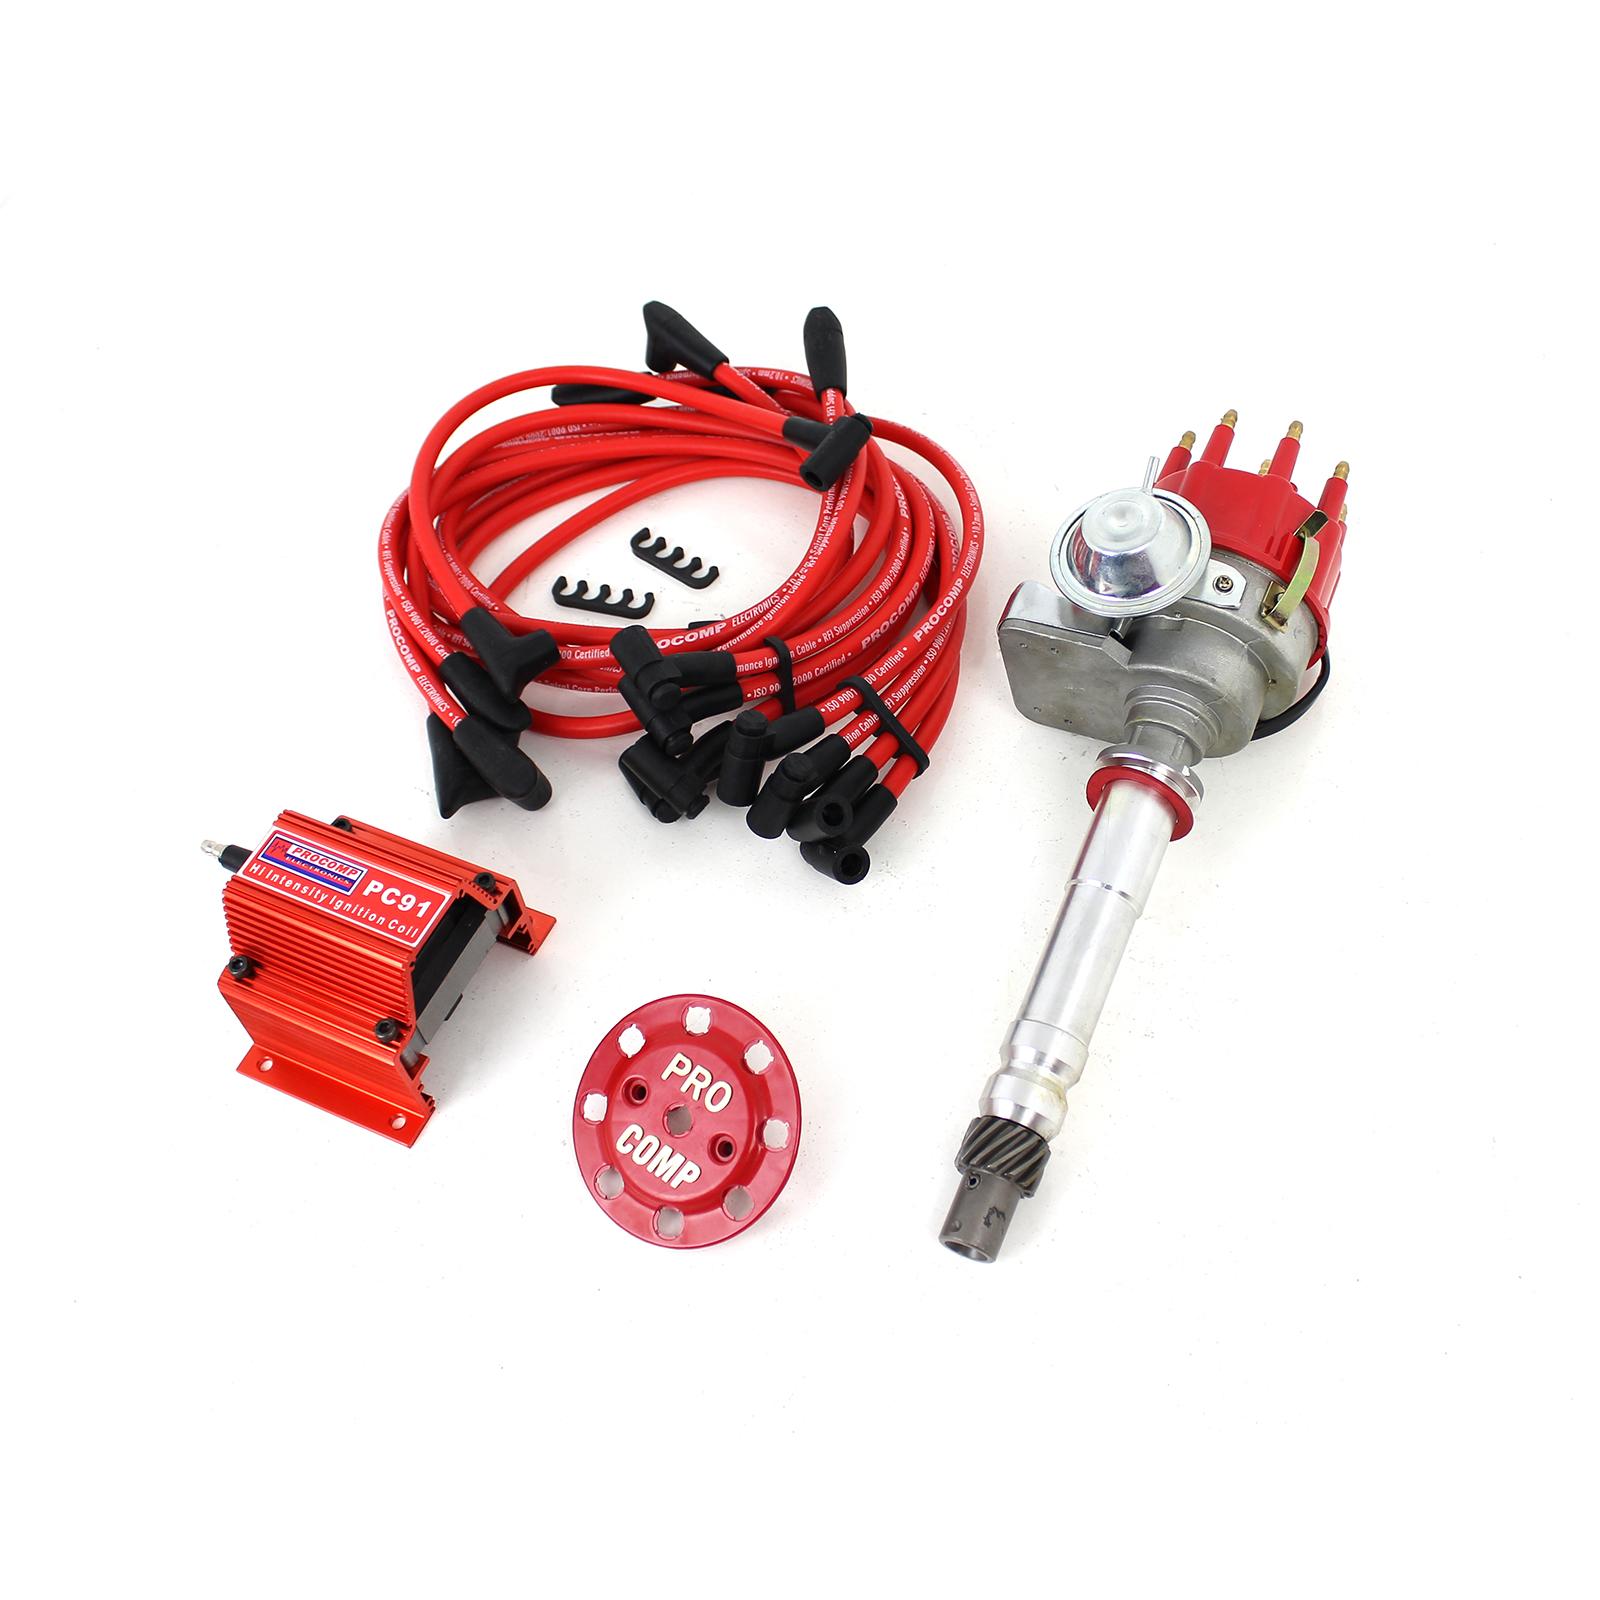 speedmaster pce385 1004 ignition system combo kits ebay